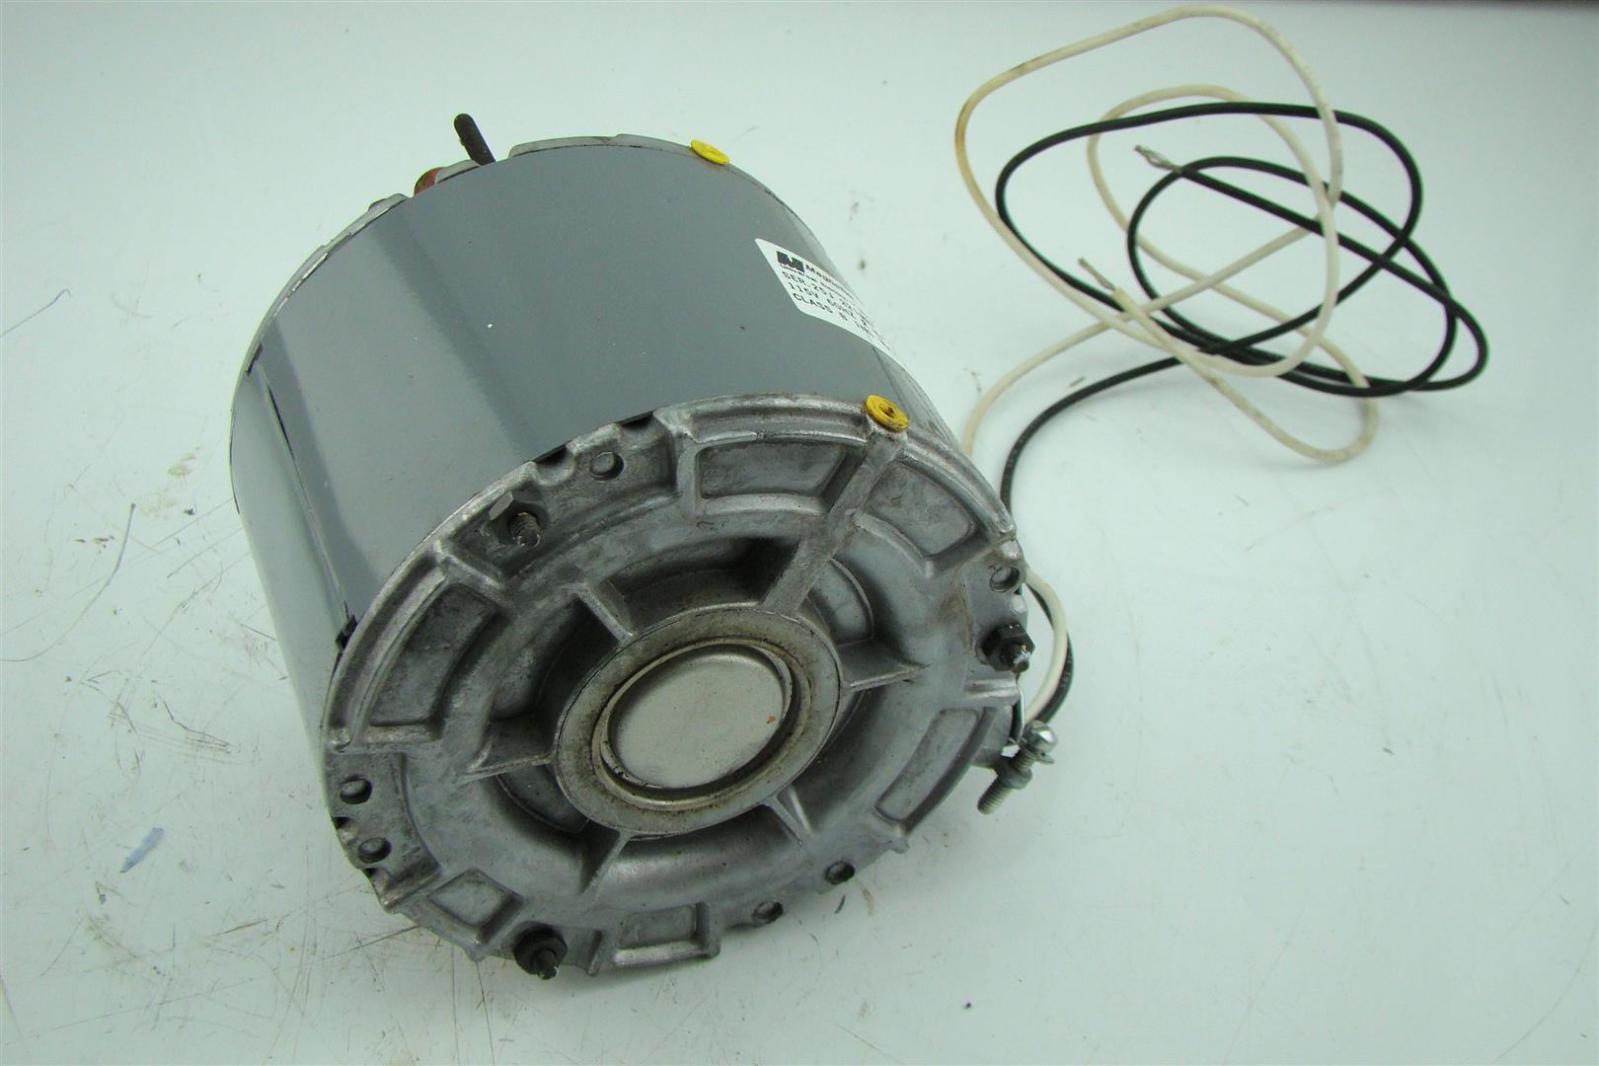 Magnetek Pool Pump Motor Wiring Diagram : Wiring diagram motor ao smith electric